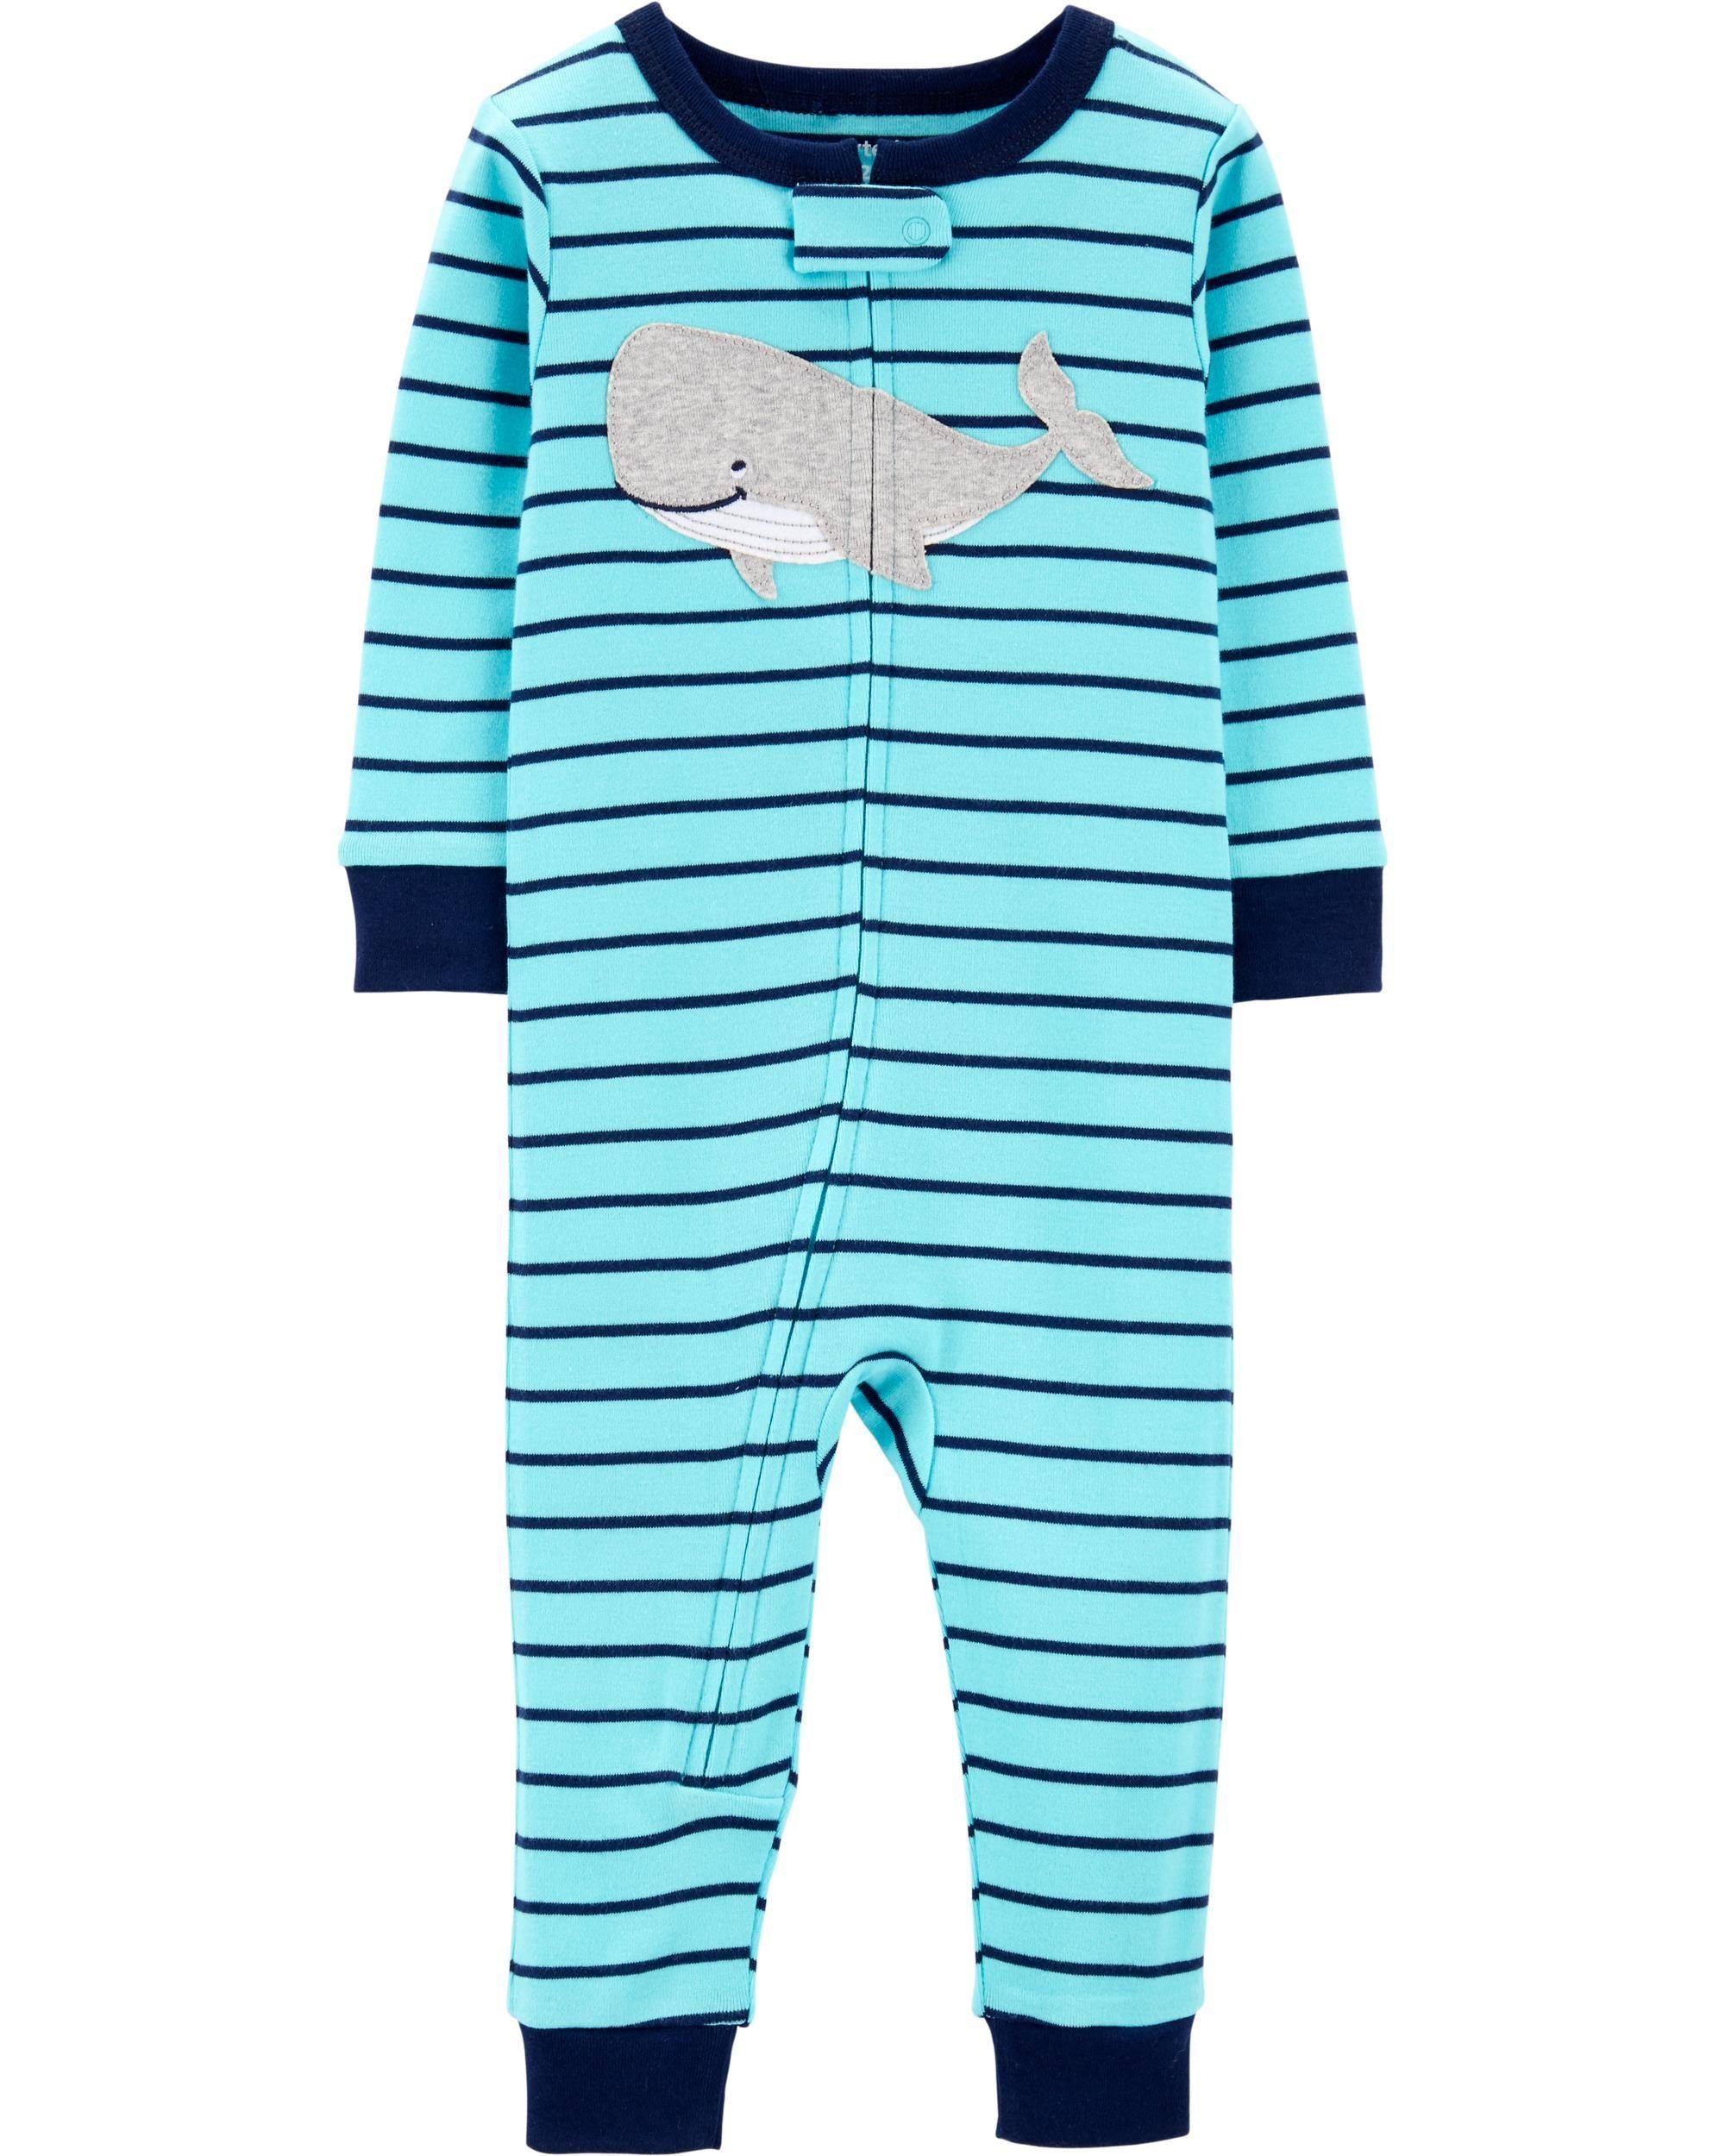 f52e9a9f47a1 1-Piece Whale Snug Fit Cotton Footless PJs